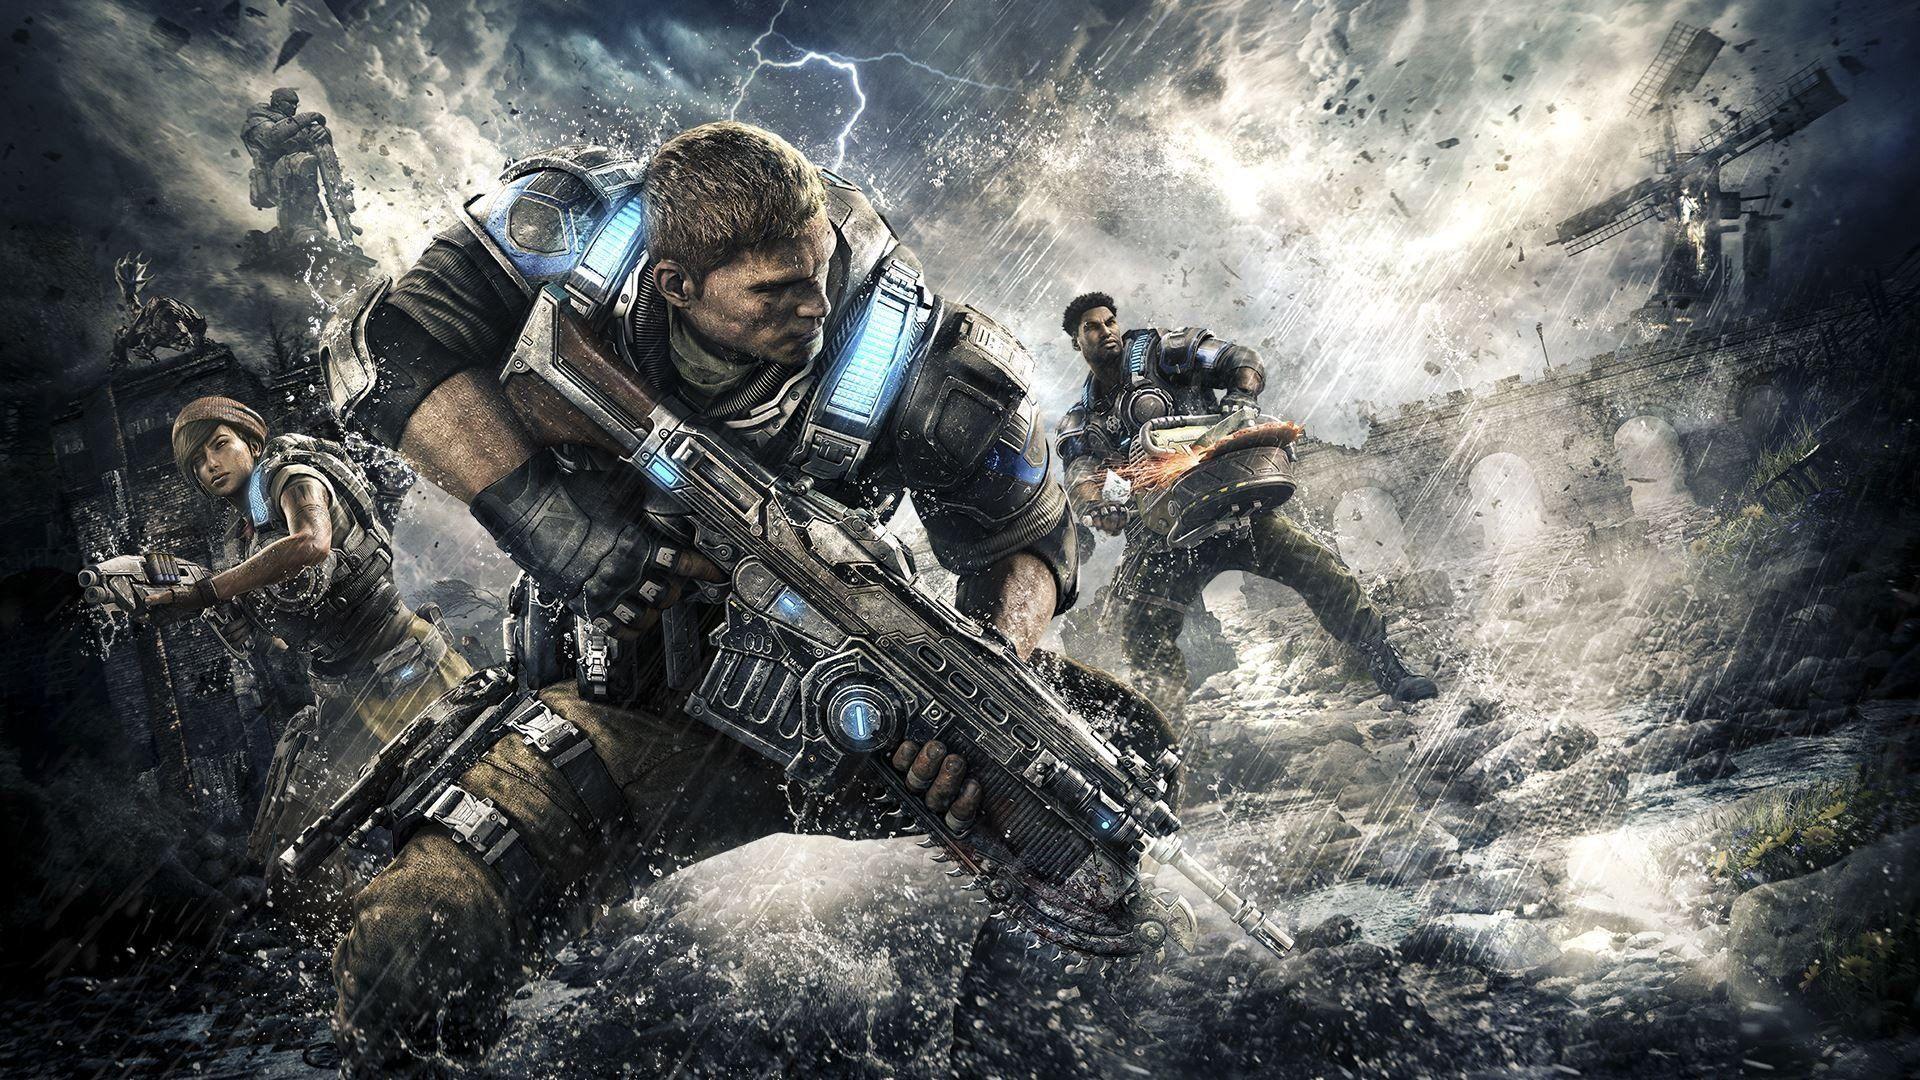 Gears Of War 4 Wallpapers Top Free Gears Of War 4 Backgrounds